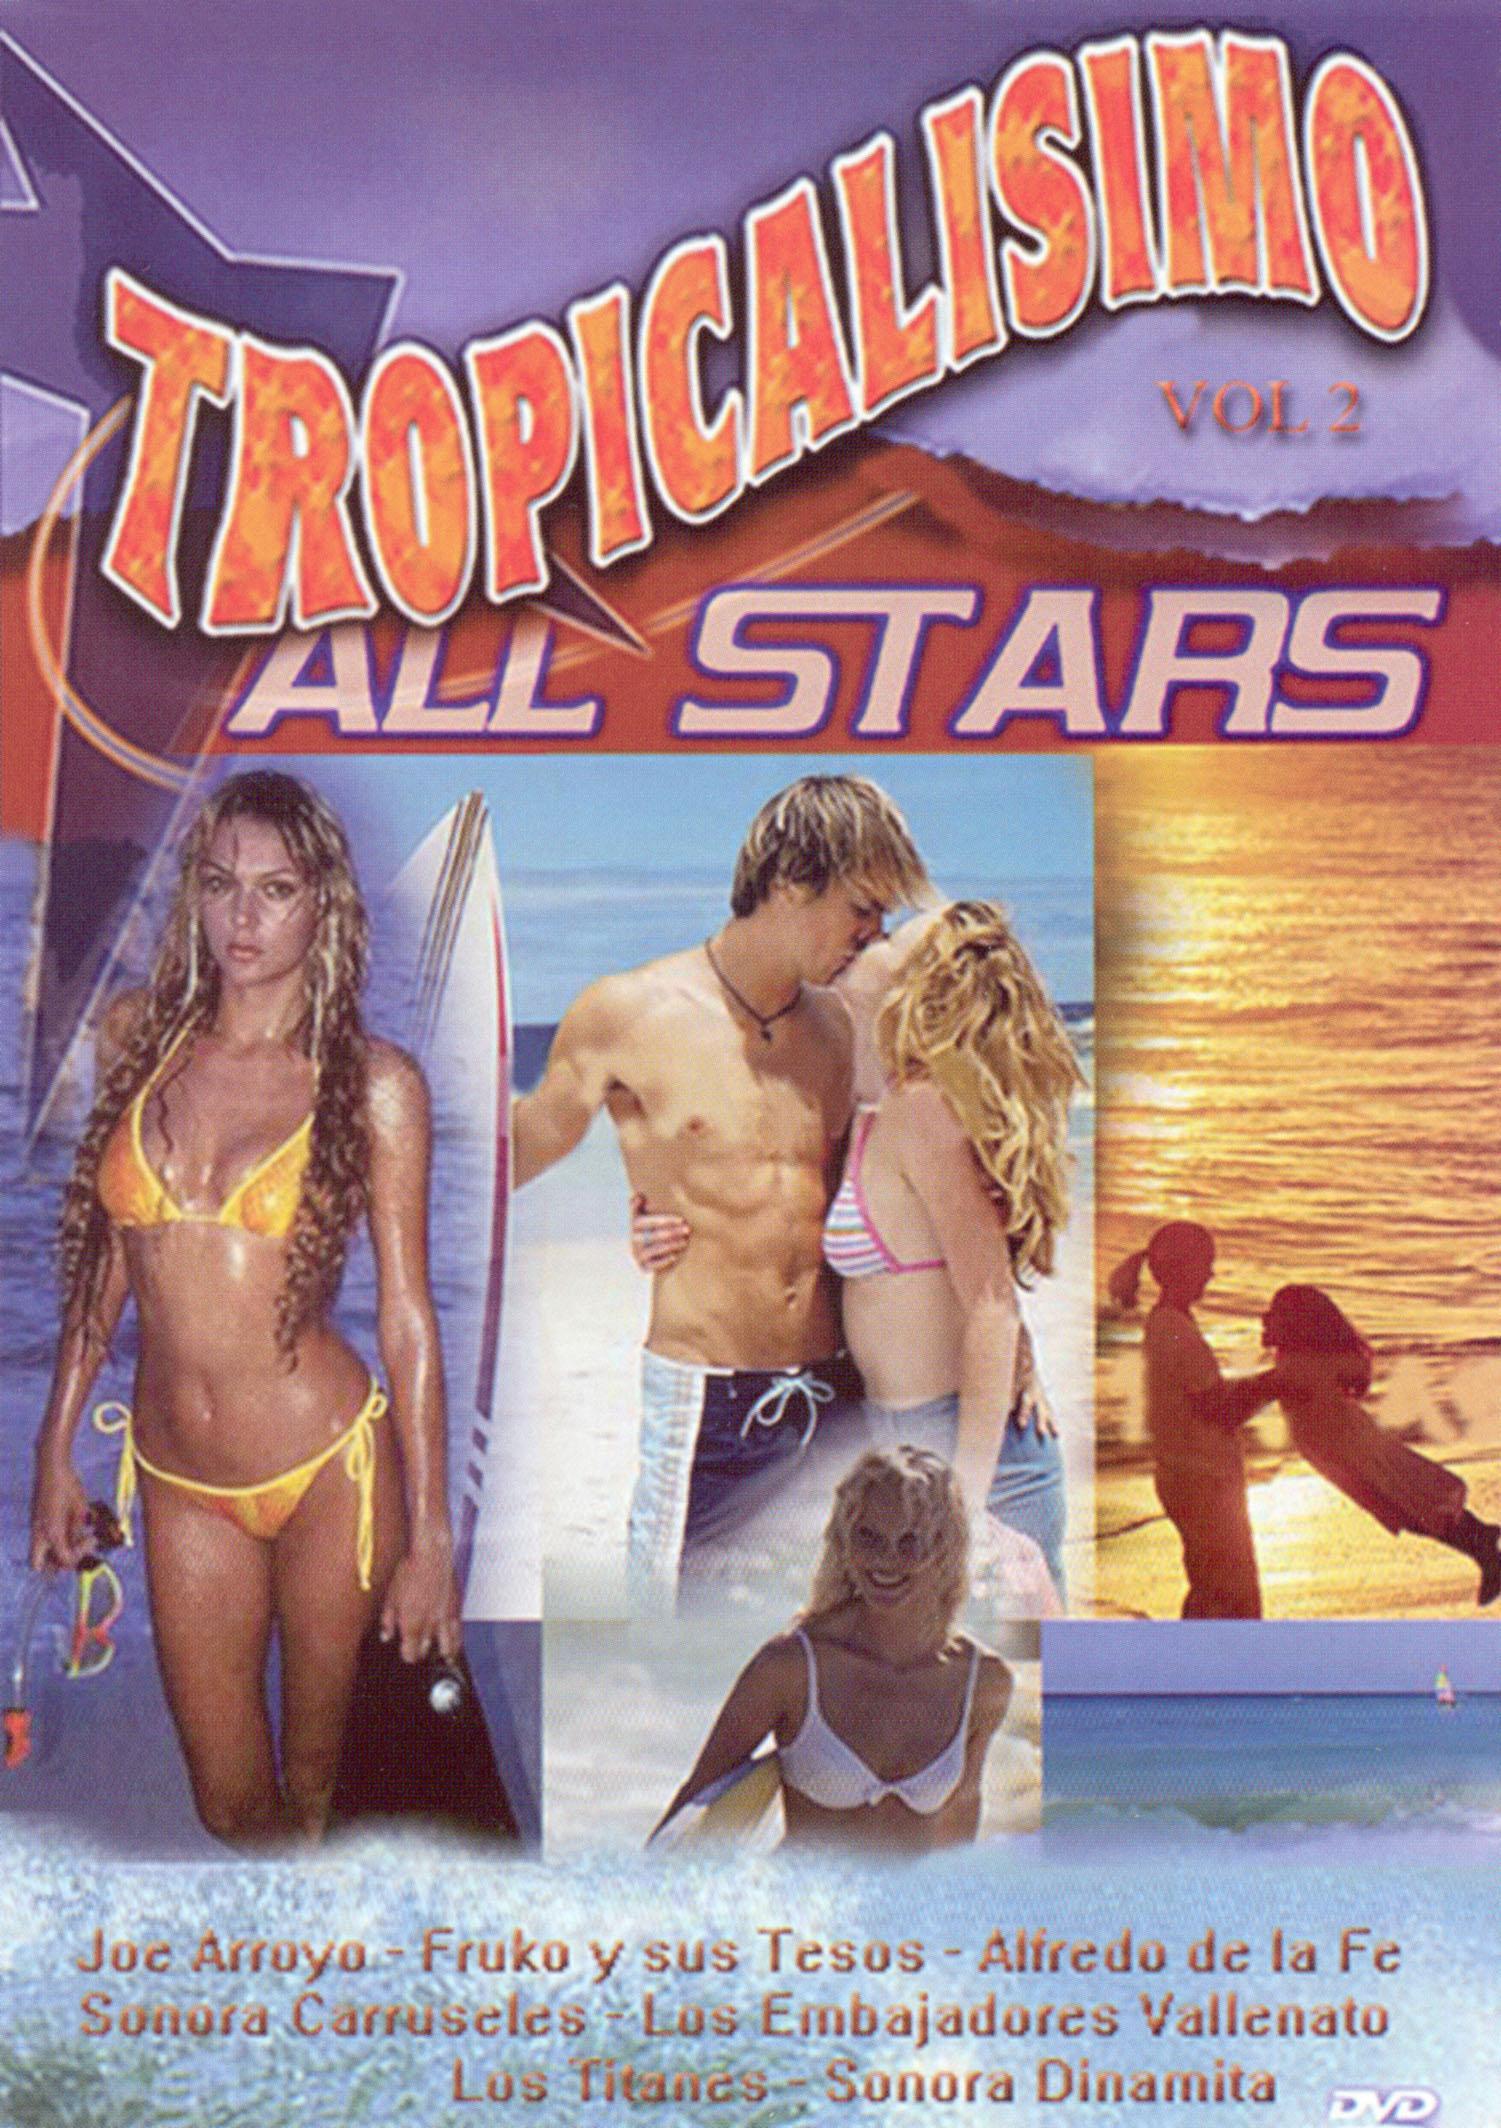 Tropicalisimo All Stars, Vol. 2